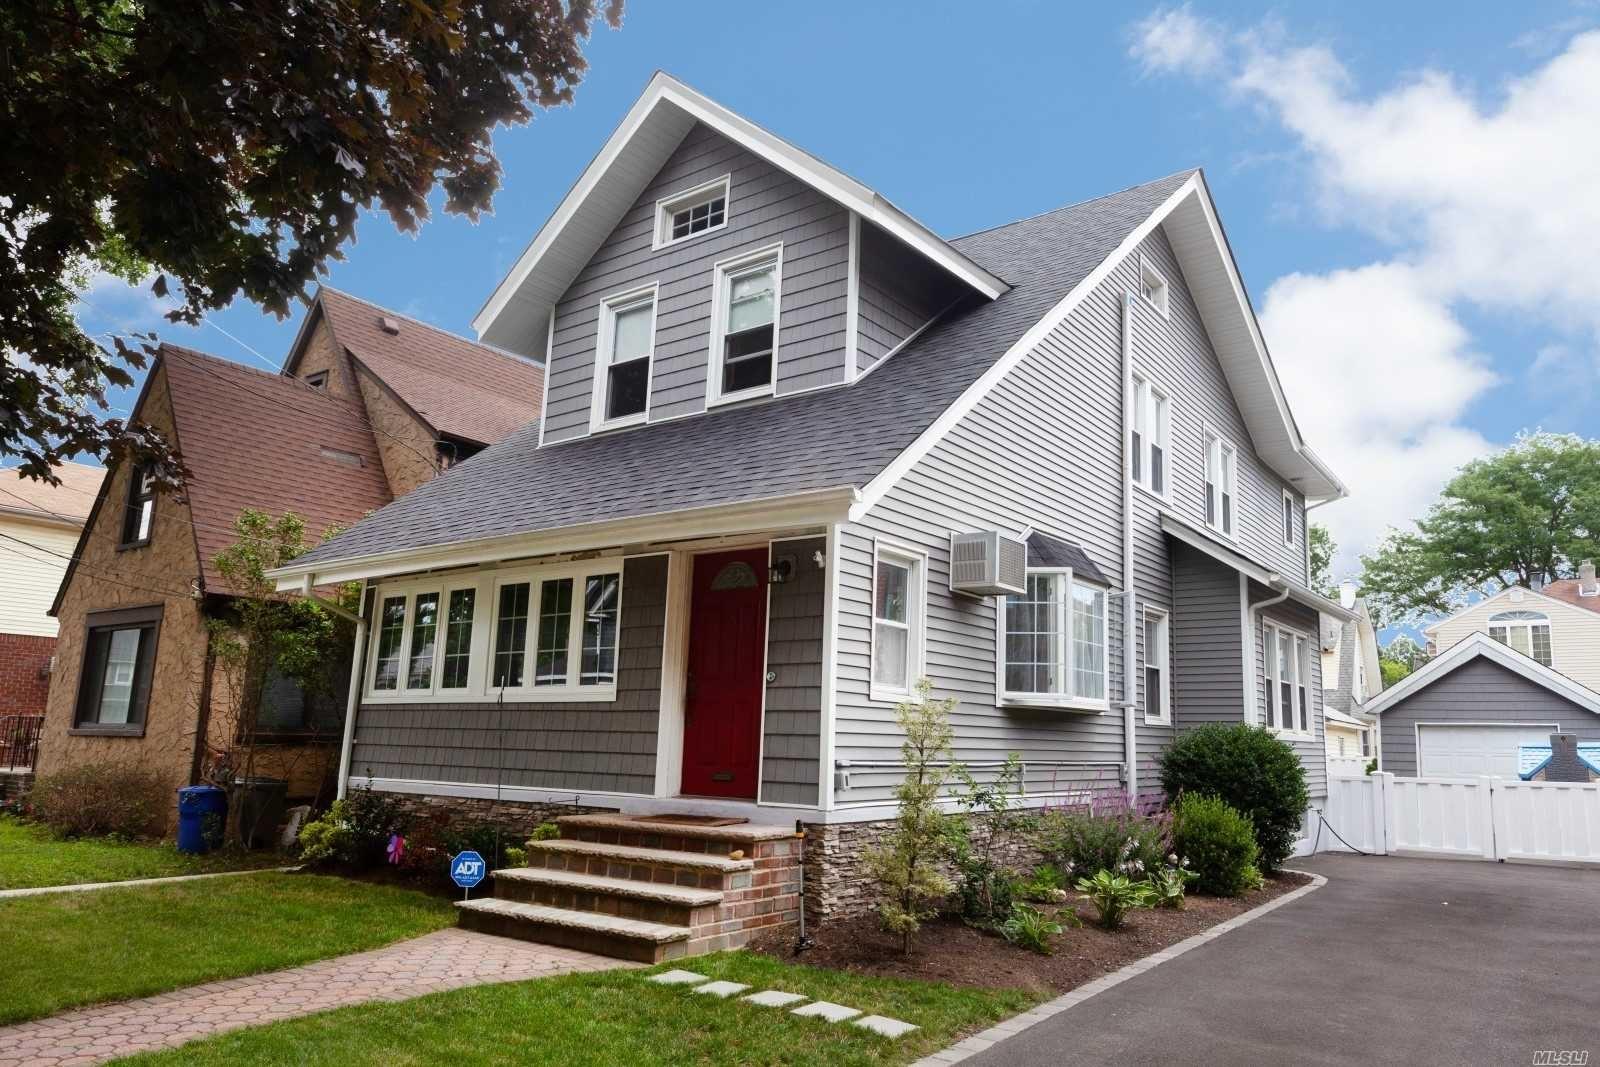 35 Ward Street, Floral Park, NY 11001 - MLS#: 3233952